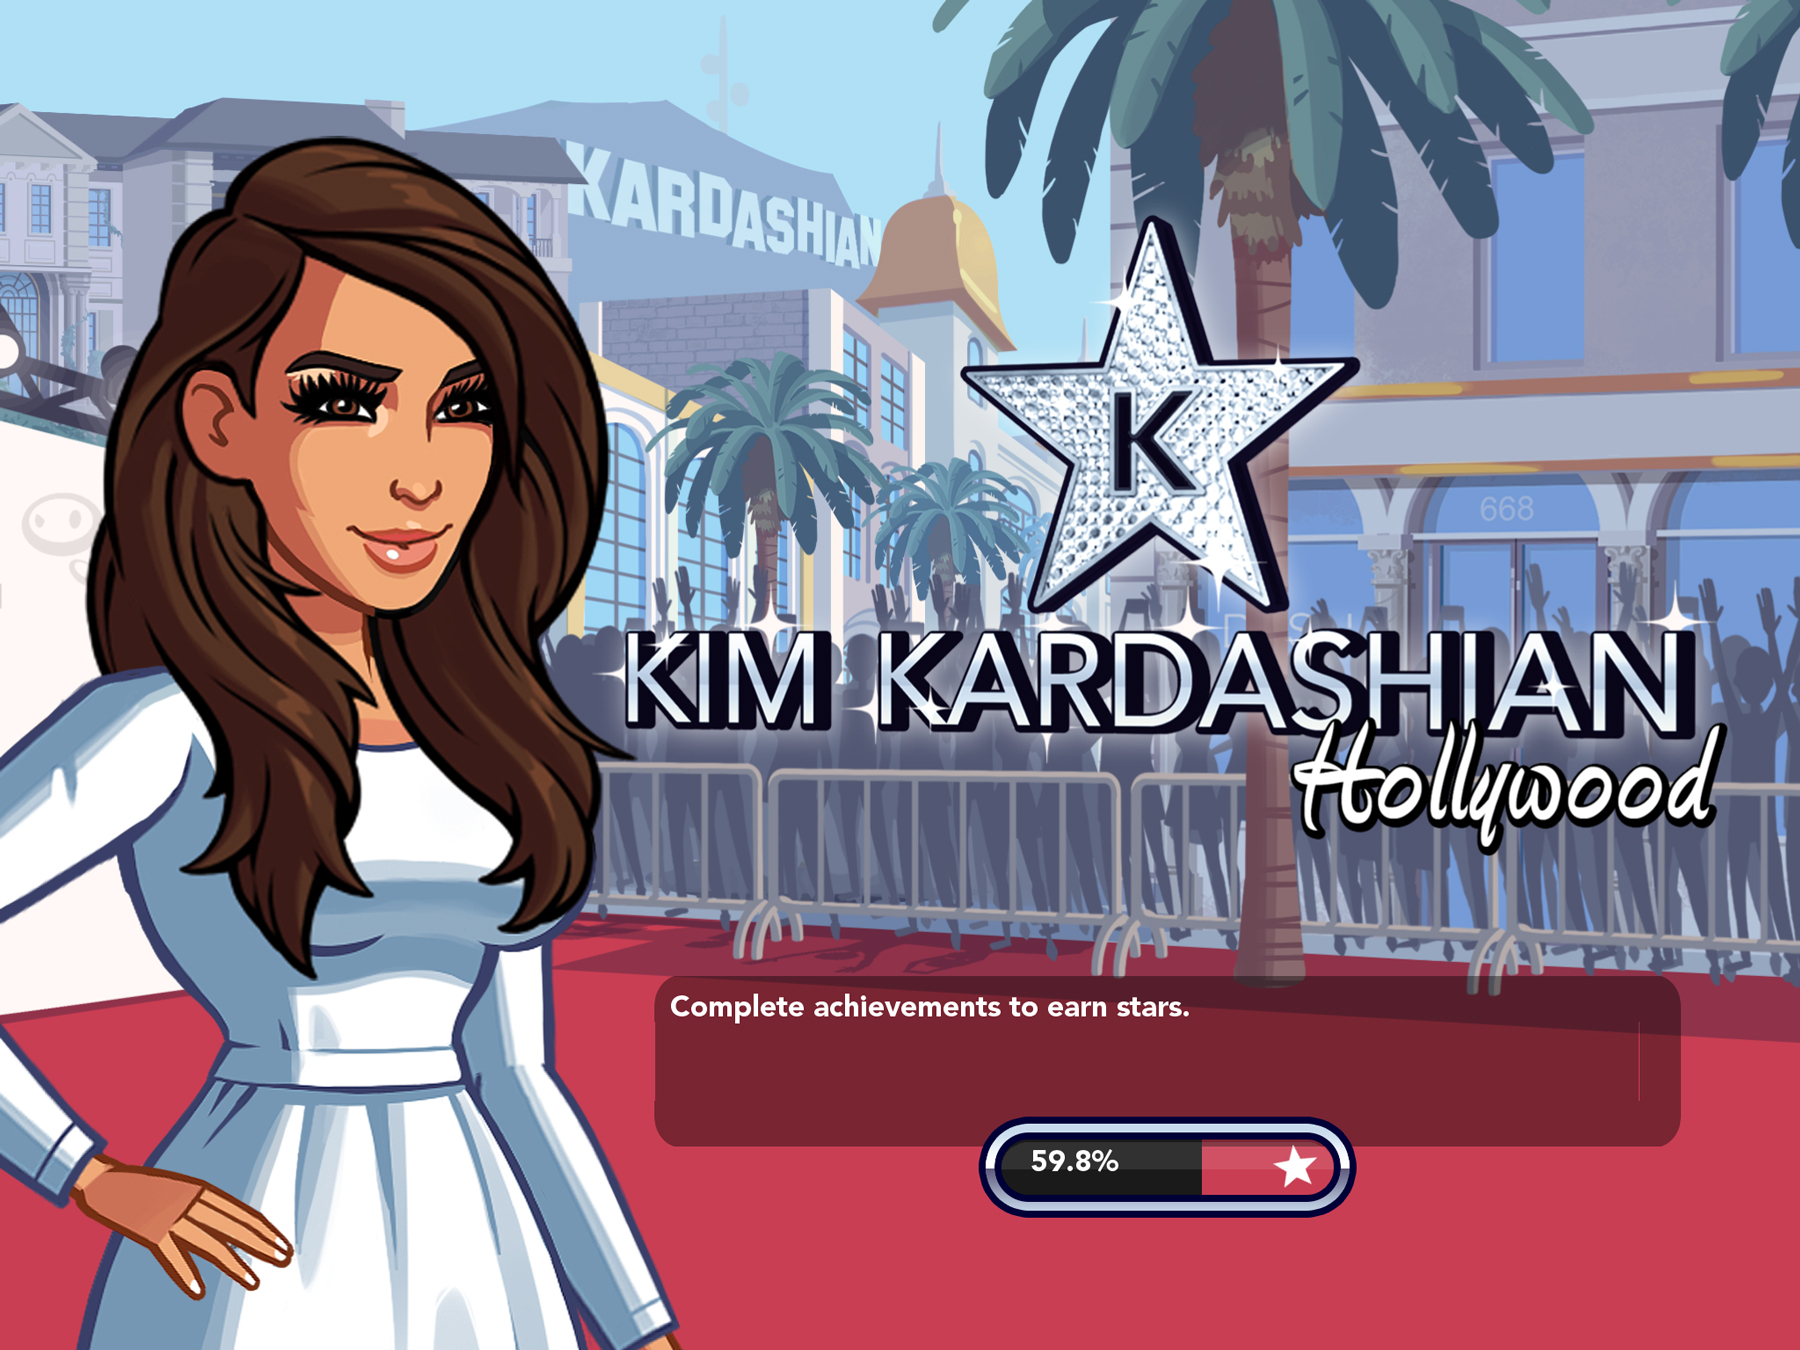 Kim Kardashian's mobile game.